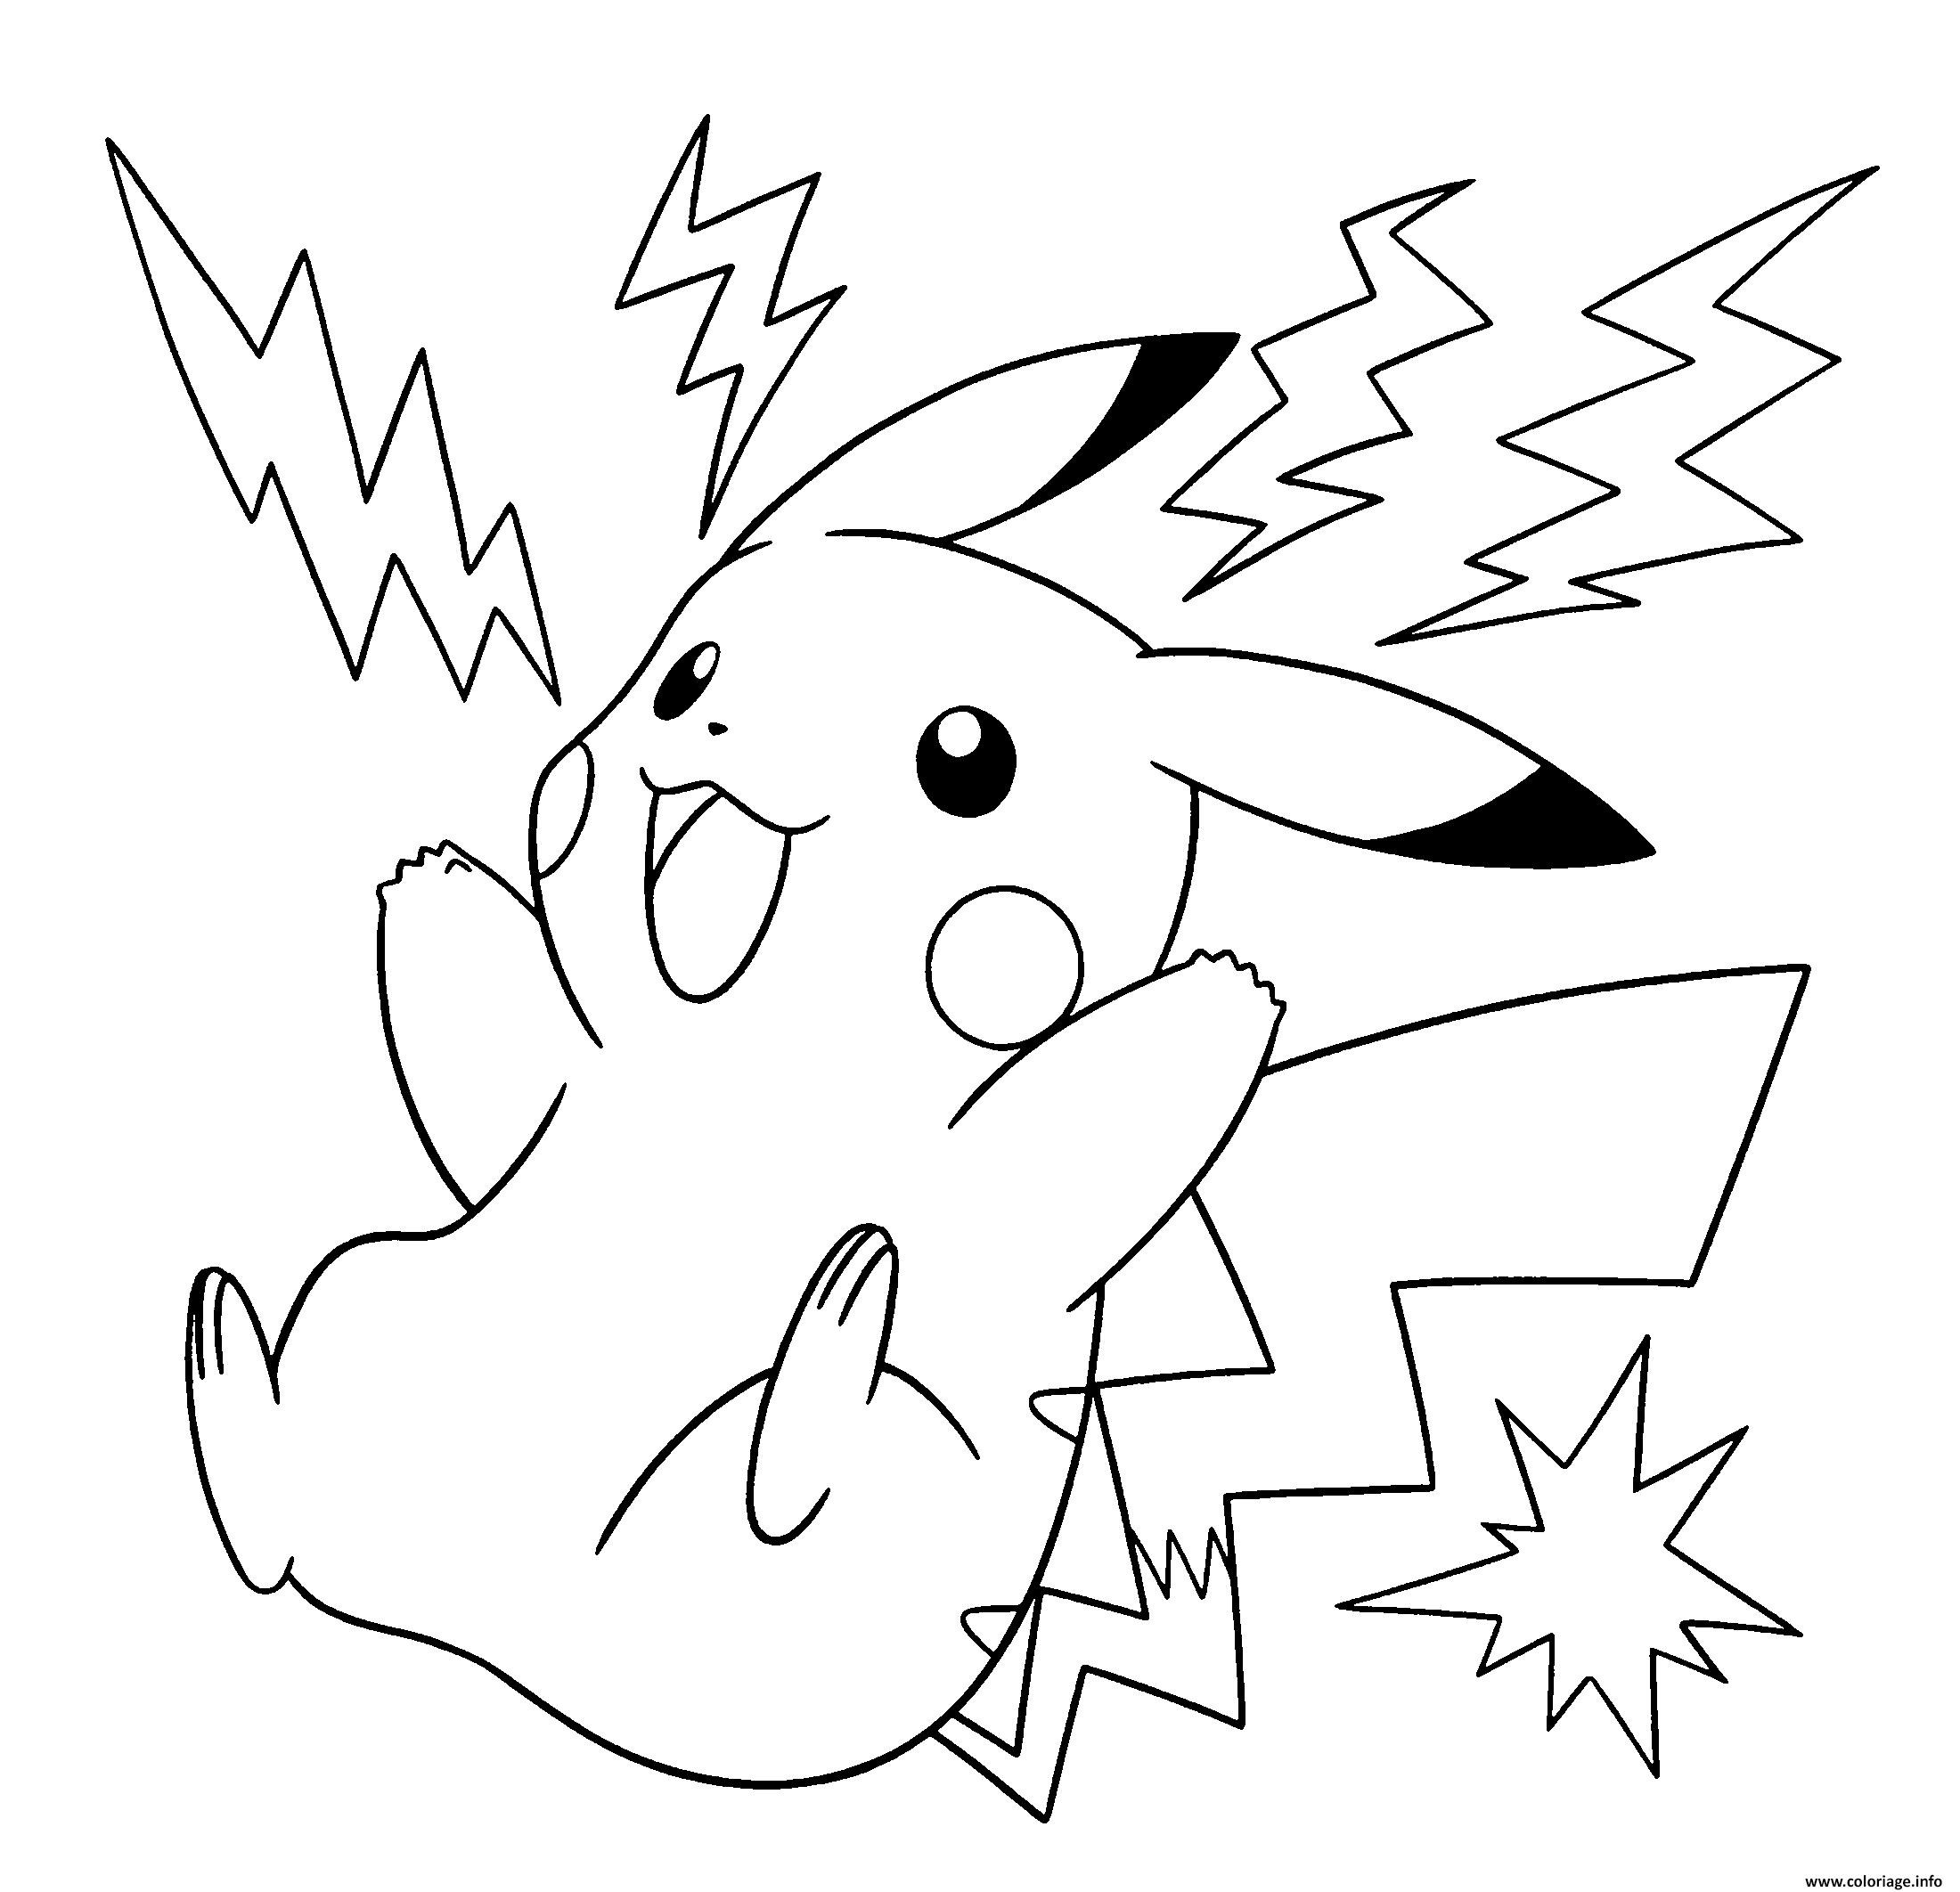 Meilleur De Dessin A Imprimer Pokemon tortank